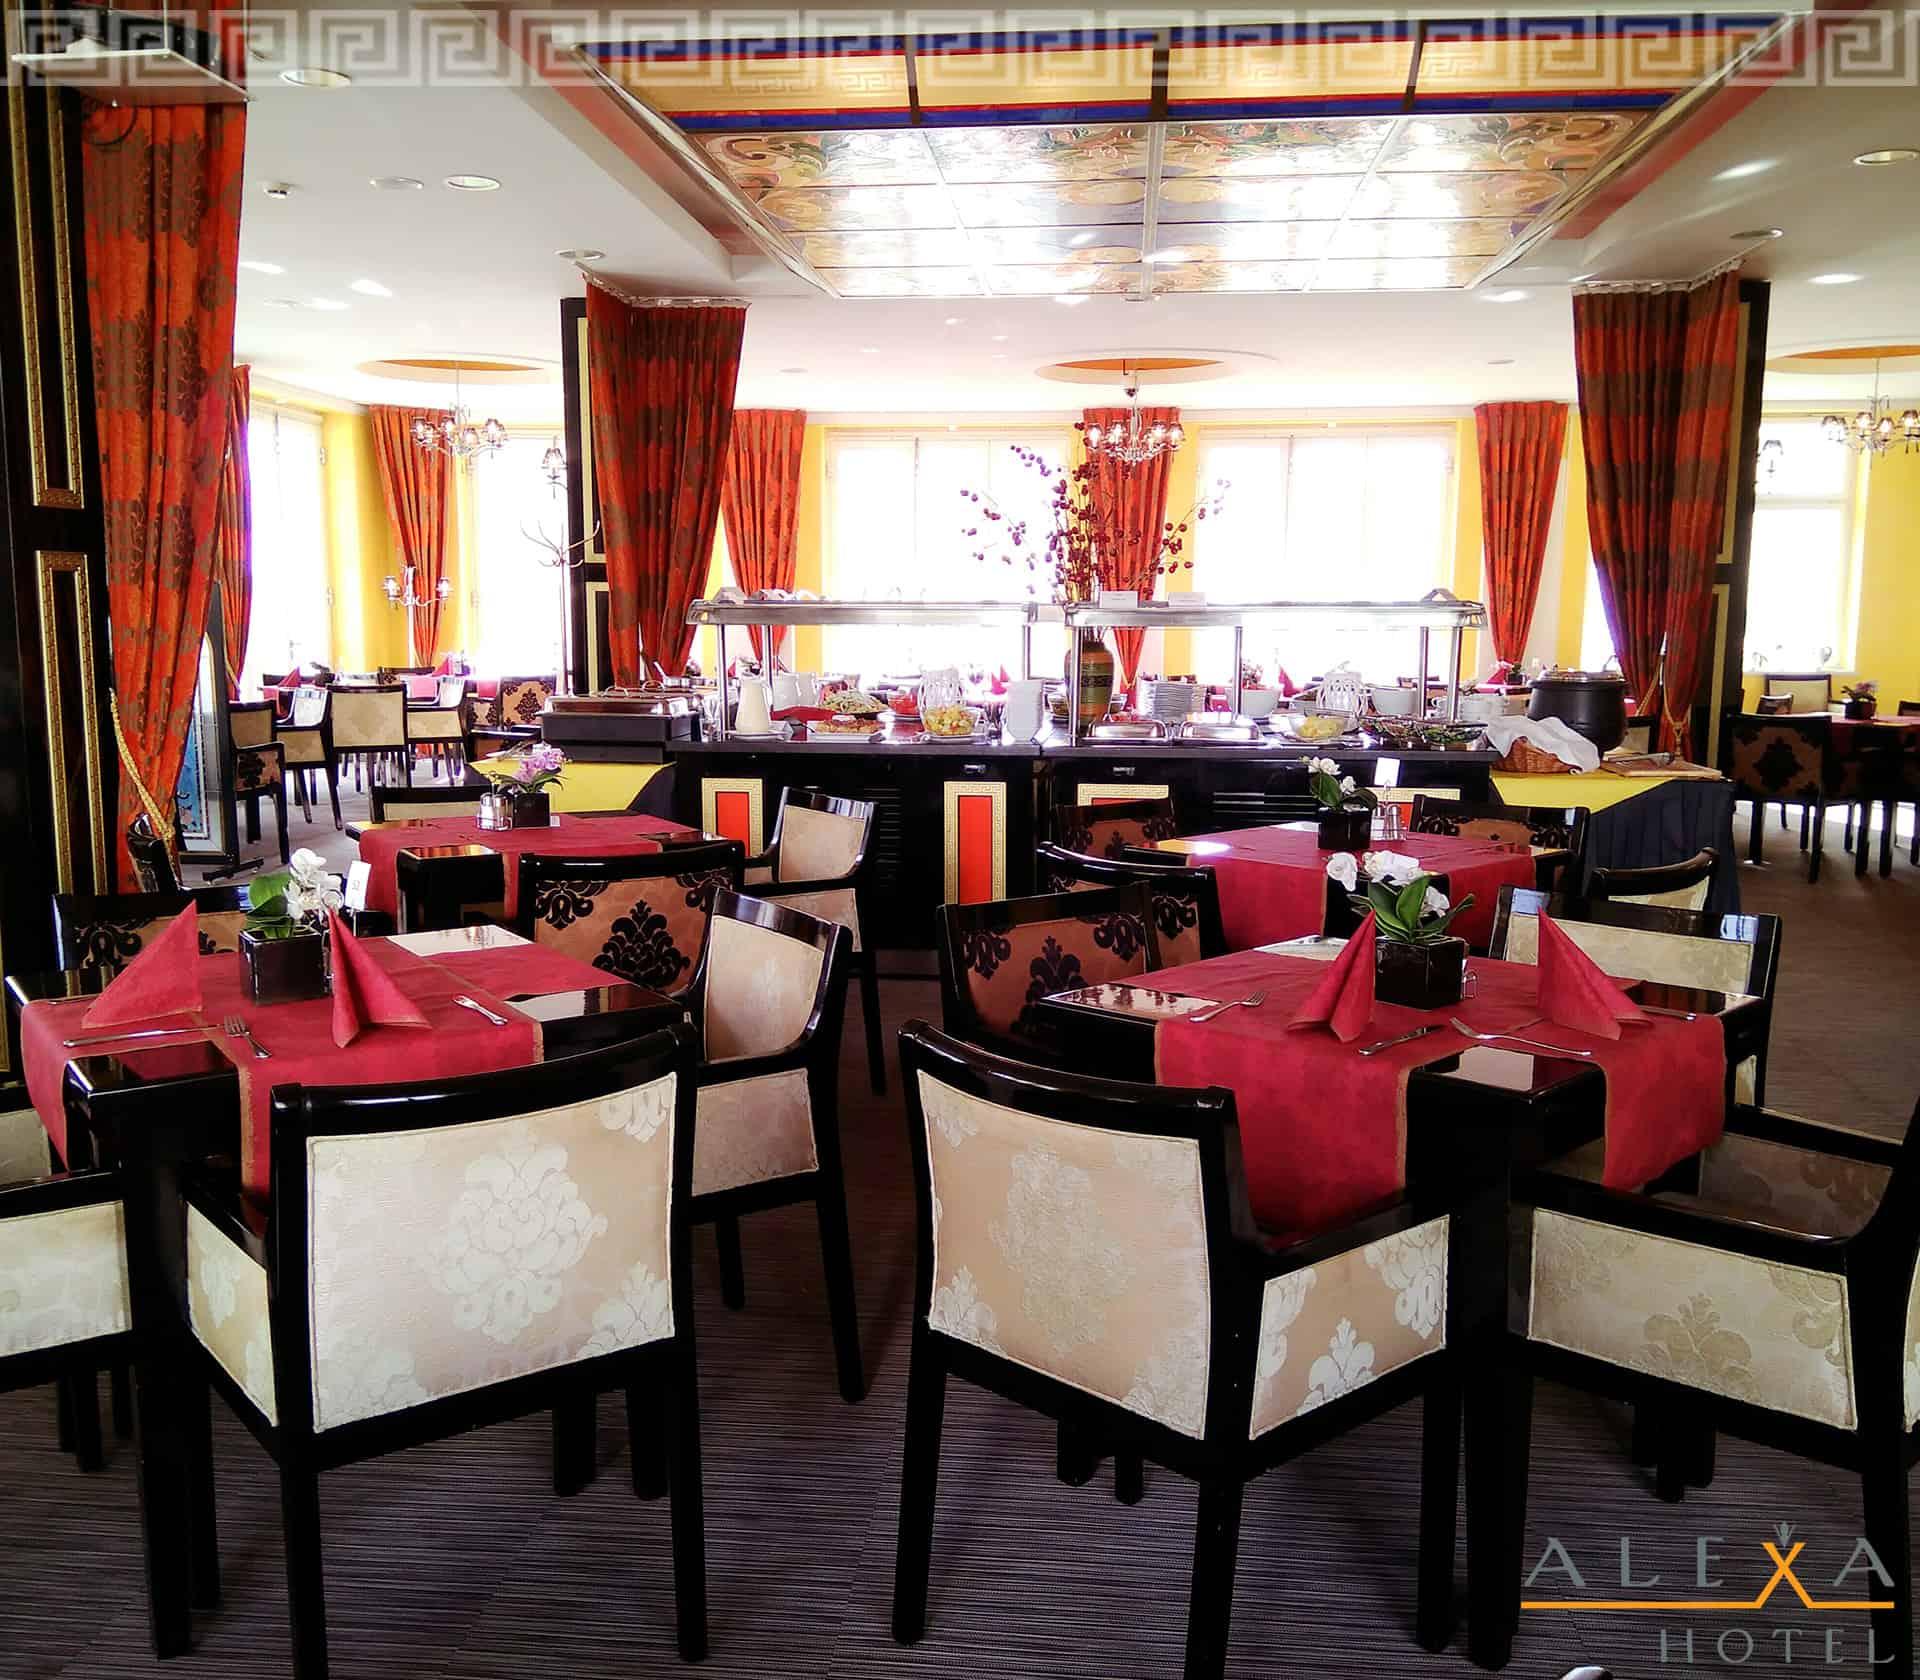 Alexa Hotel - Restaurant Alexa